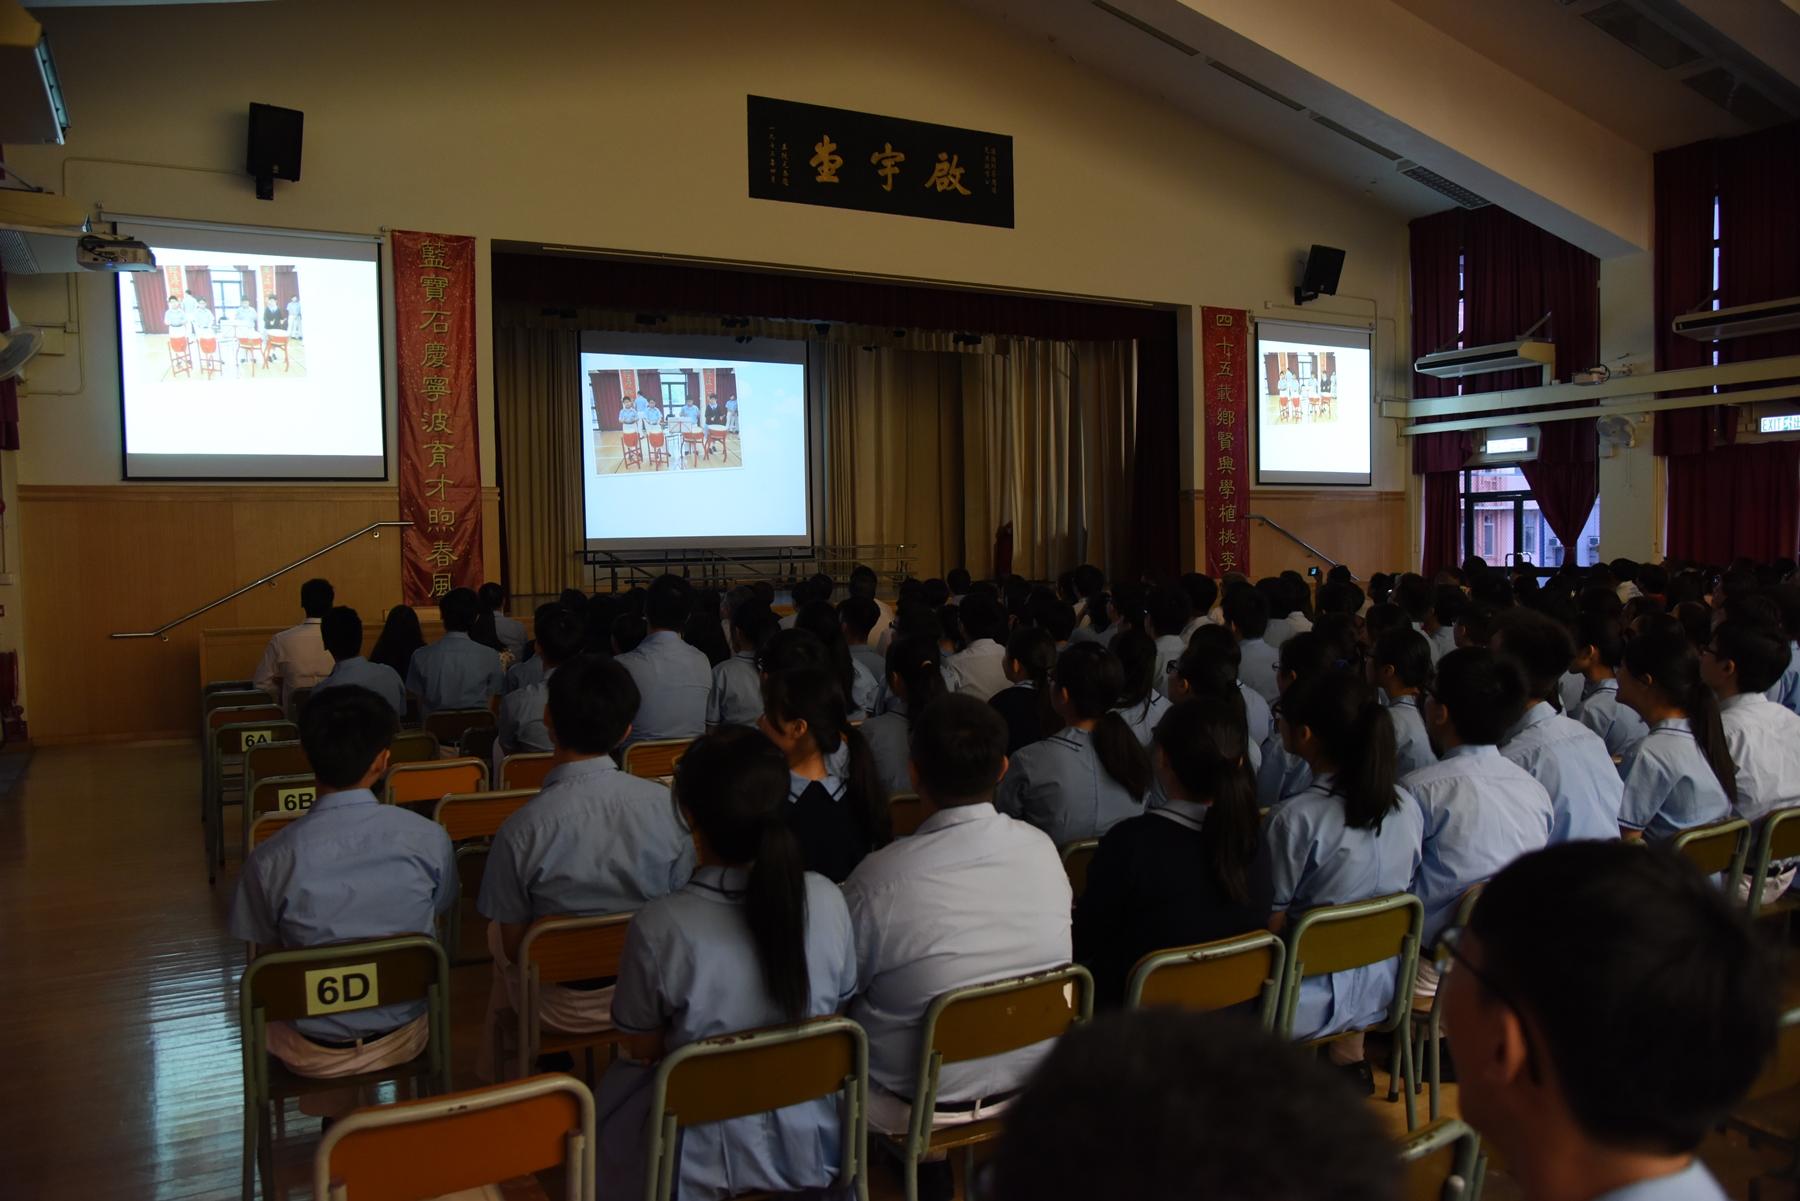 http://npc.edu.hk/sites/default/files/dsc_1358.jpg